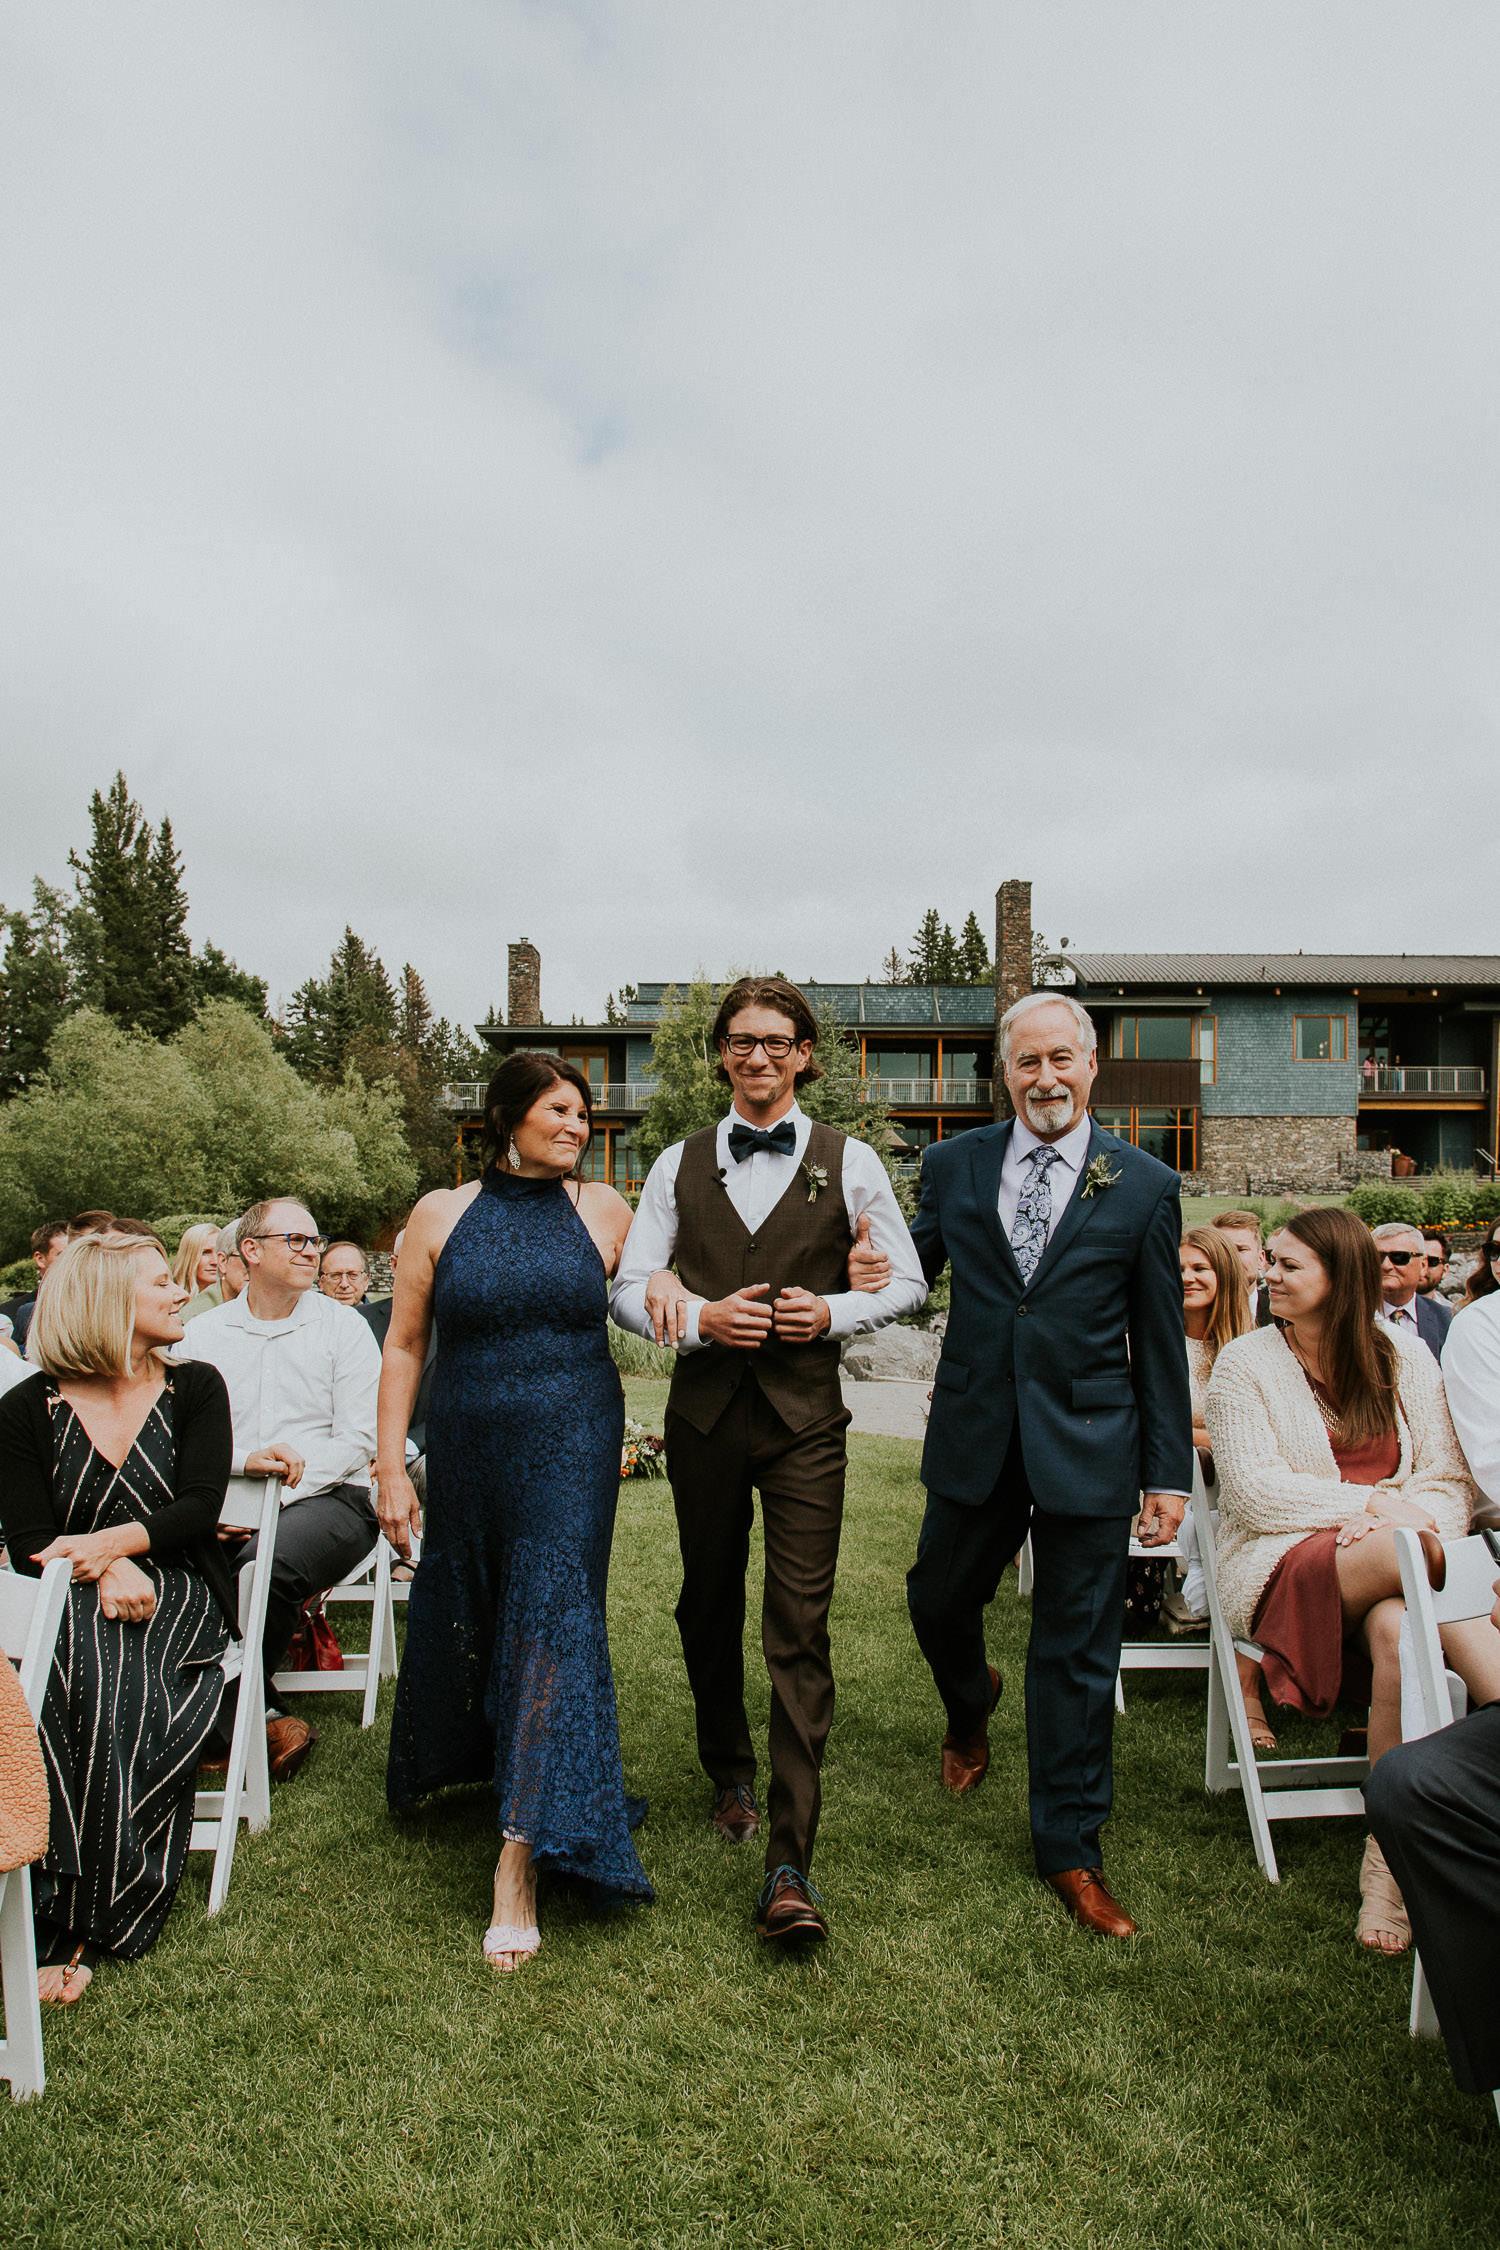 azuridge-estate-hotel-wedding-photographer-sarah-pukin-0124